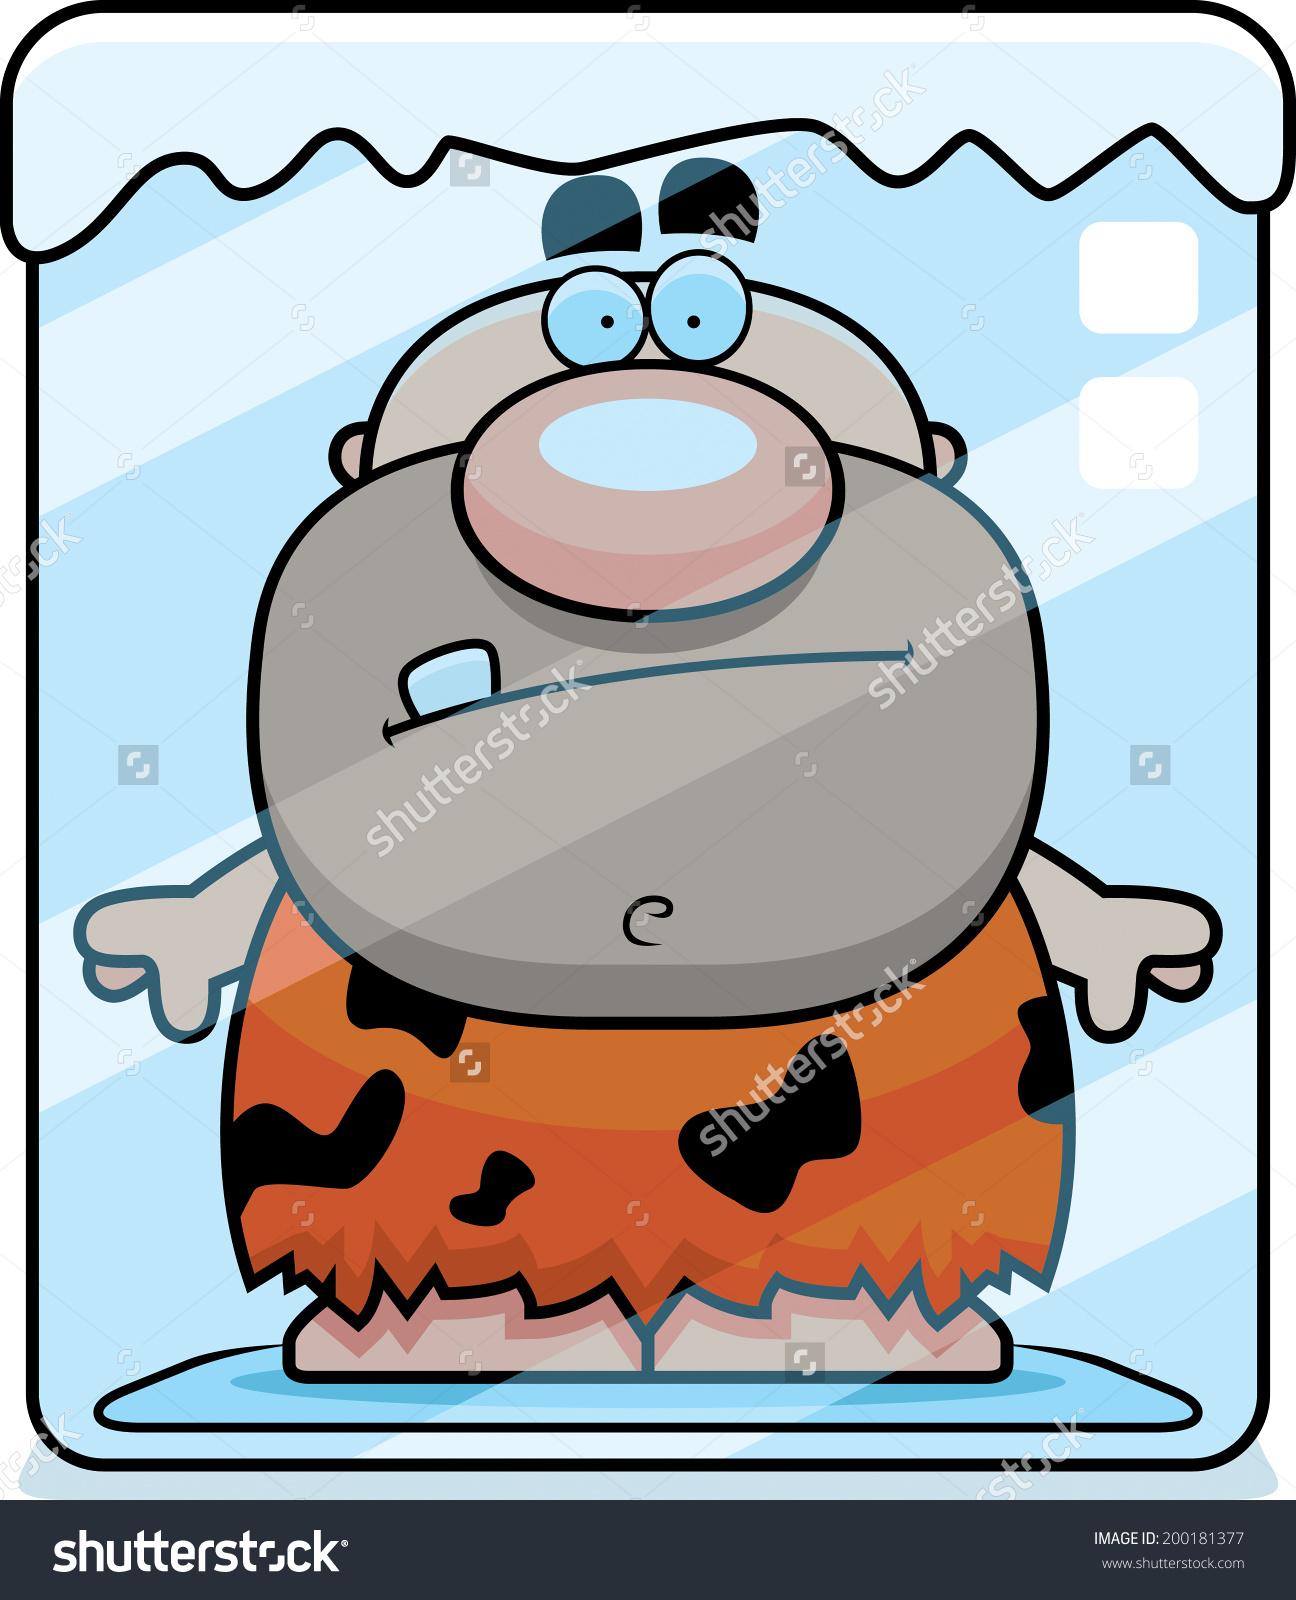 Clipart character in a block of ice vector transparent download Cartoon Caveman Frozen Block Ice Stock Vector 200181377 - Shutterstock vector transparent download